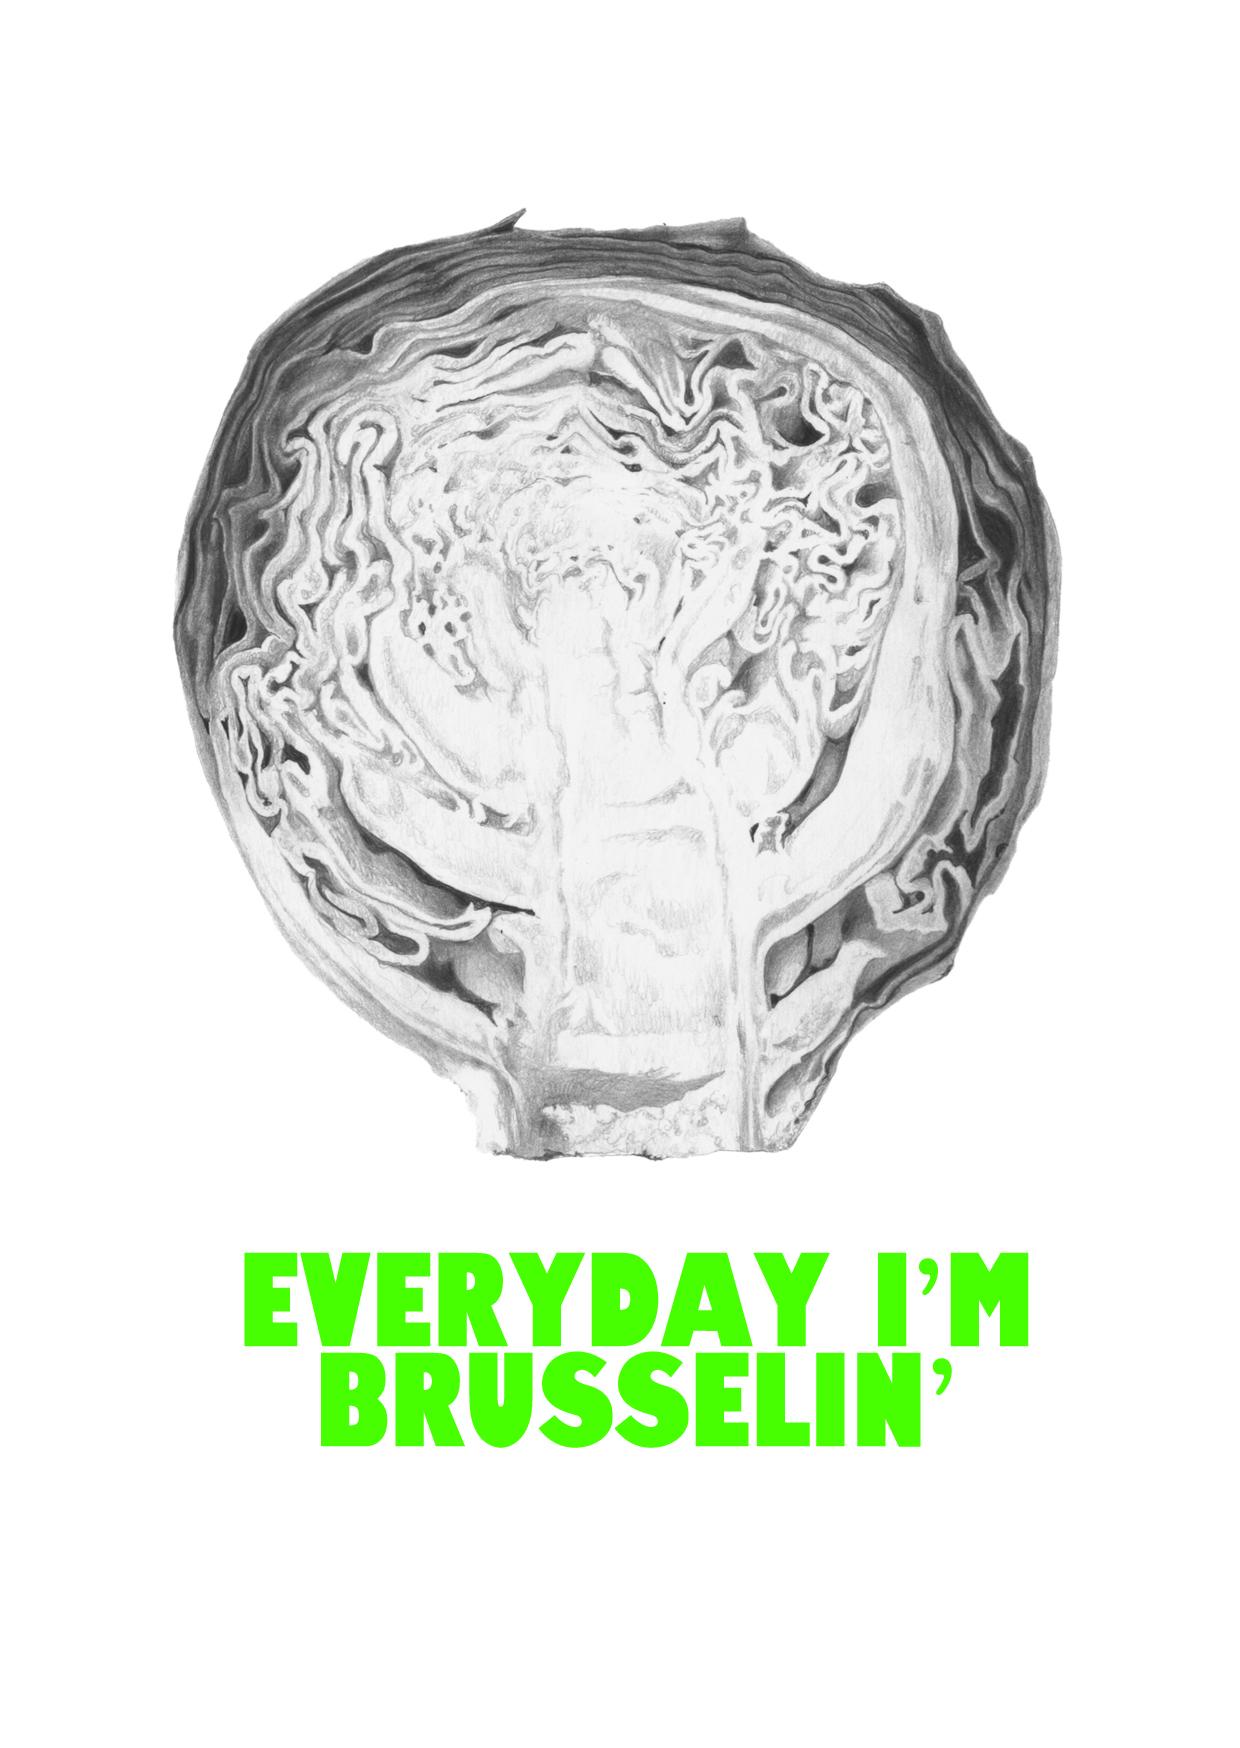 EVERYDAY I'M BRUSSELIN' A6 CARD.jpg